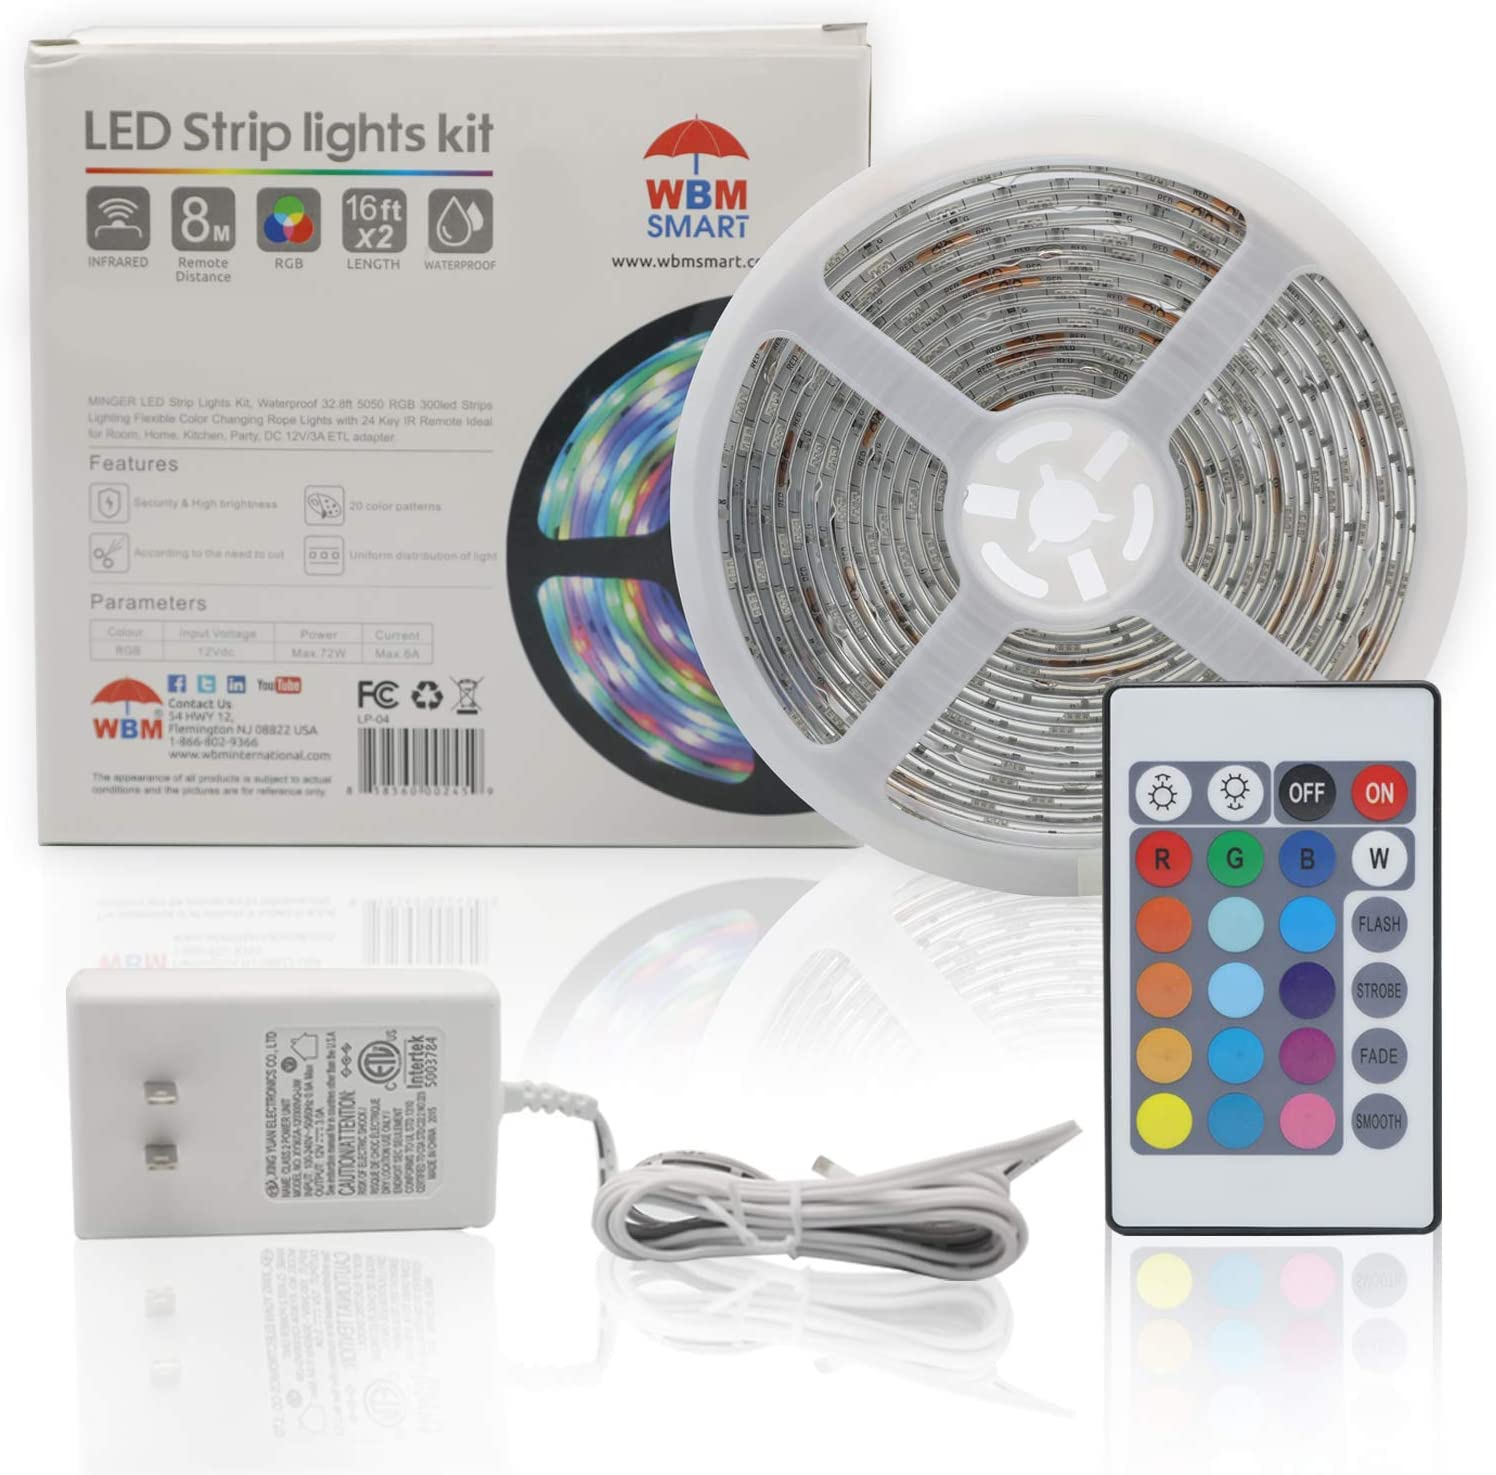 WBM Smart WBM-LP-04 LED Strip Light 5050 Changing specialty shop Color RF RGB Max 63% OFF